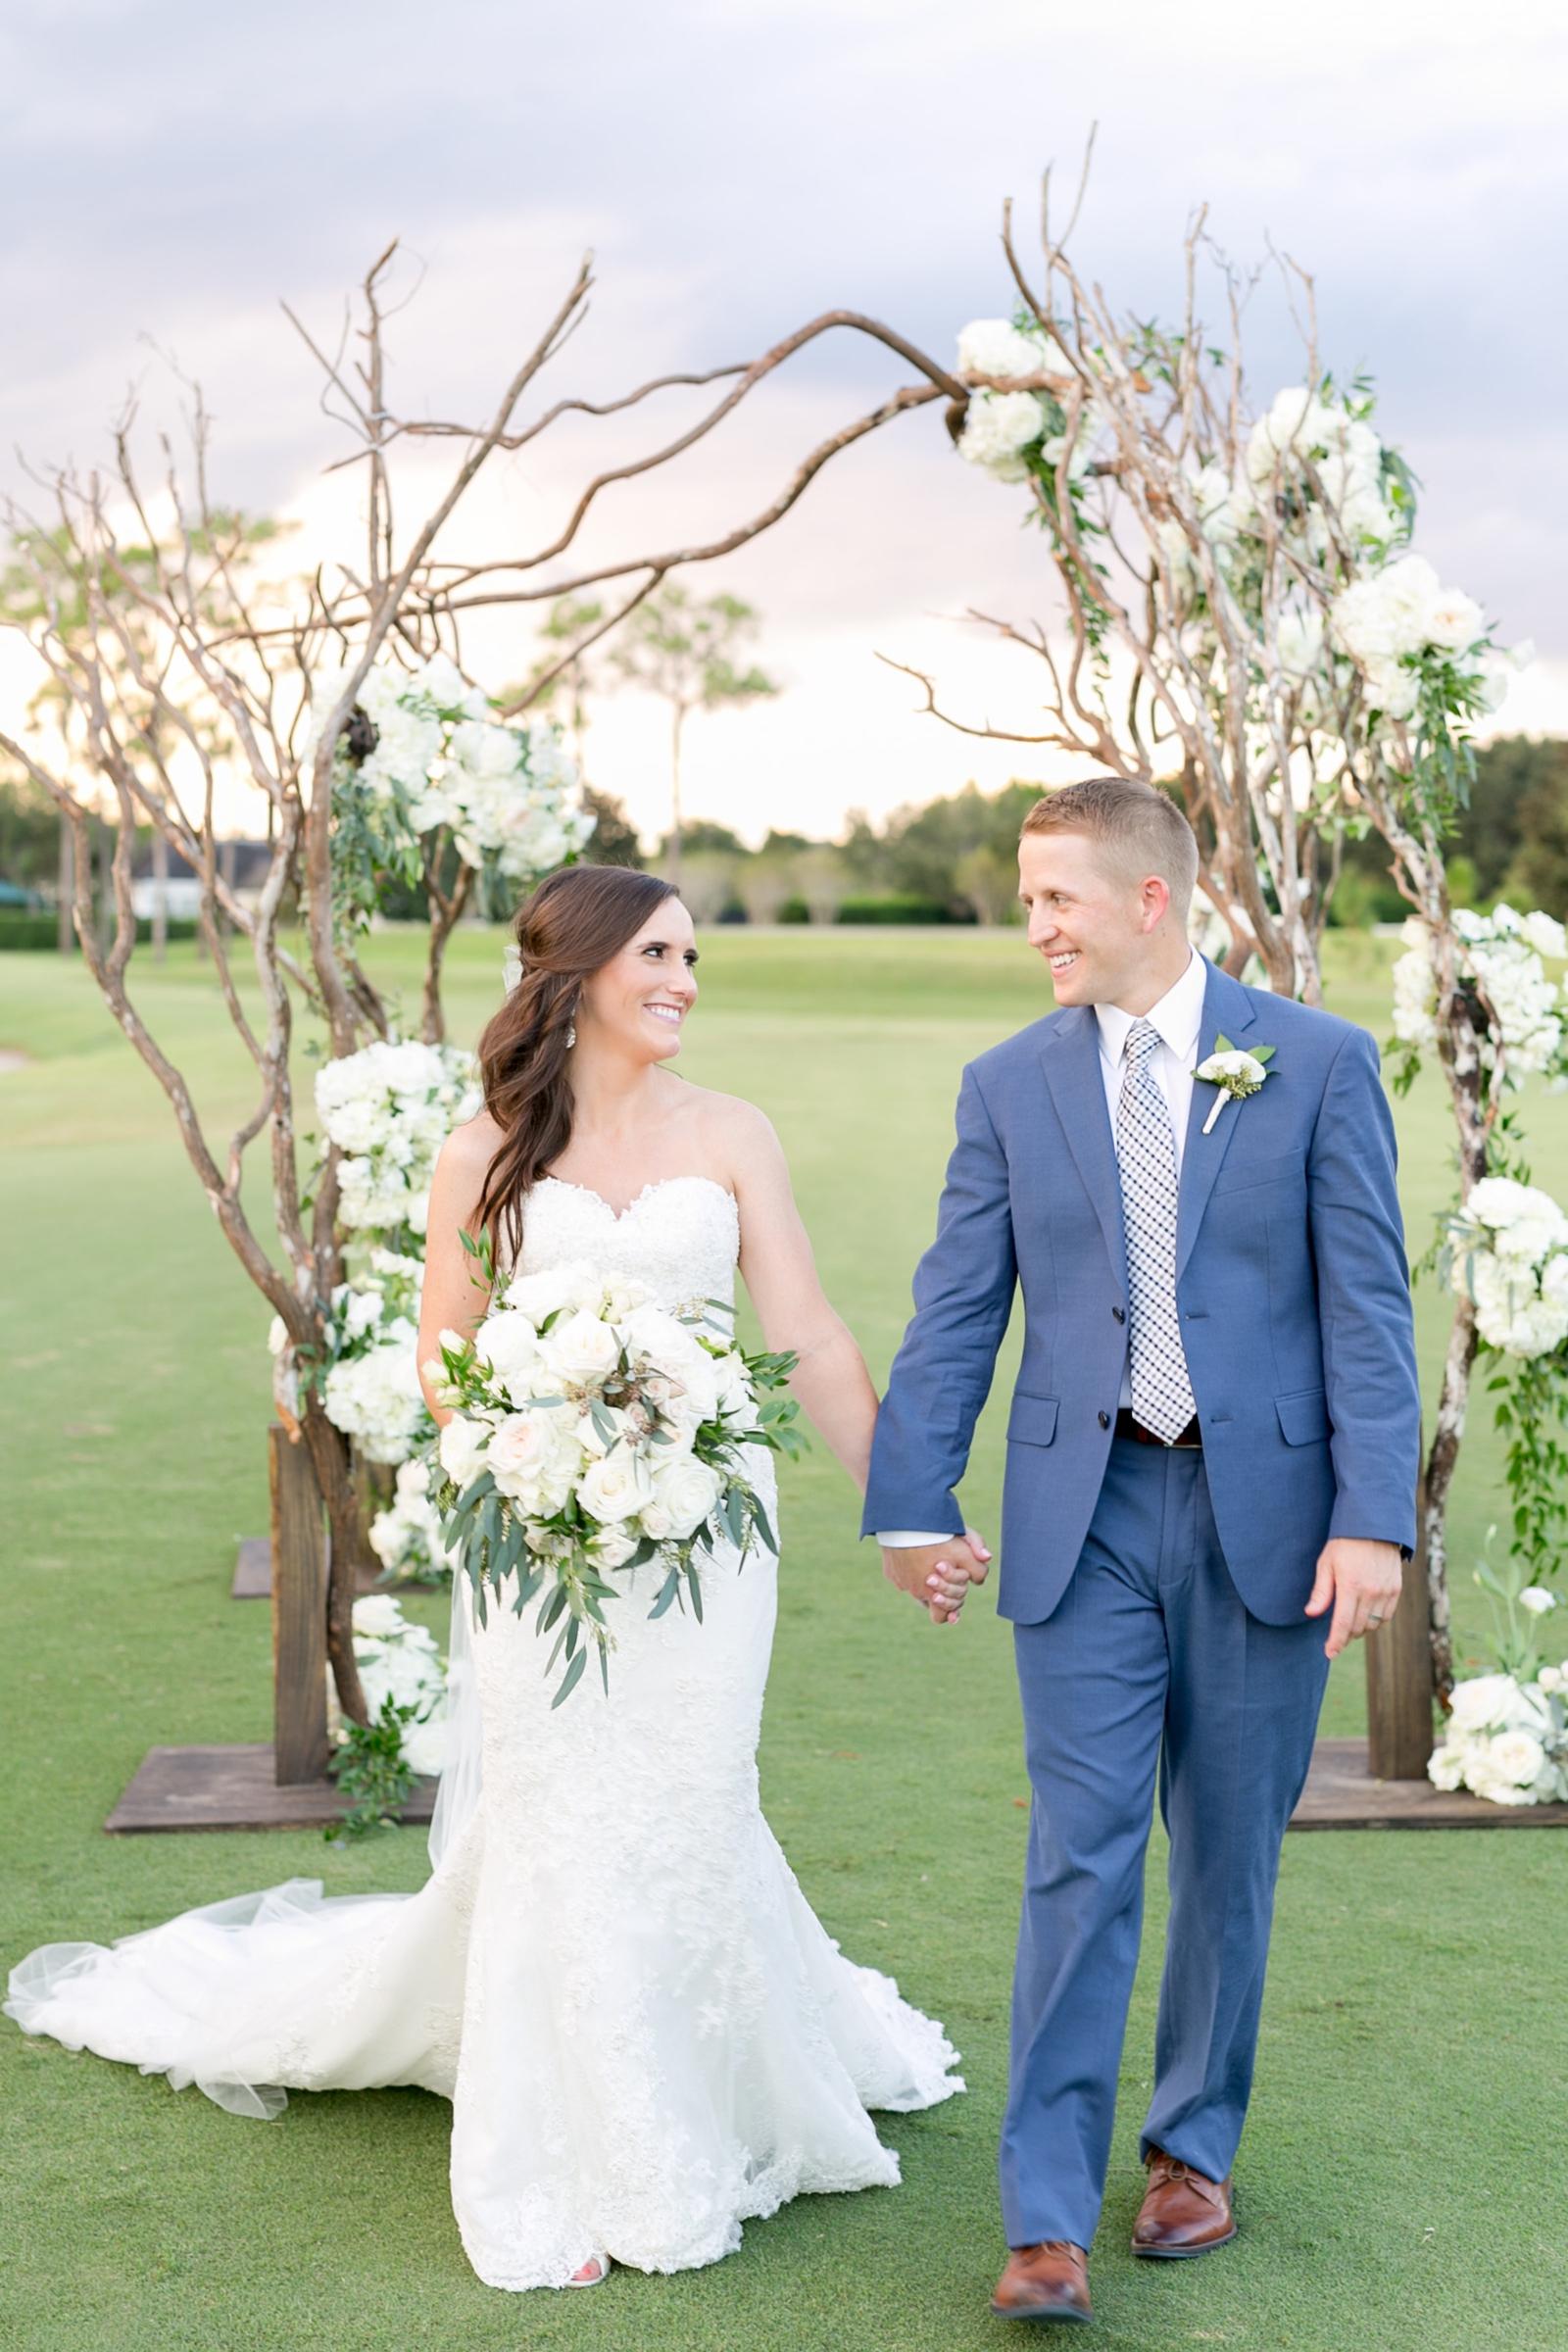 wedding chuppah made of branches